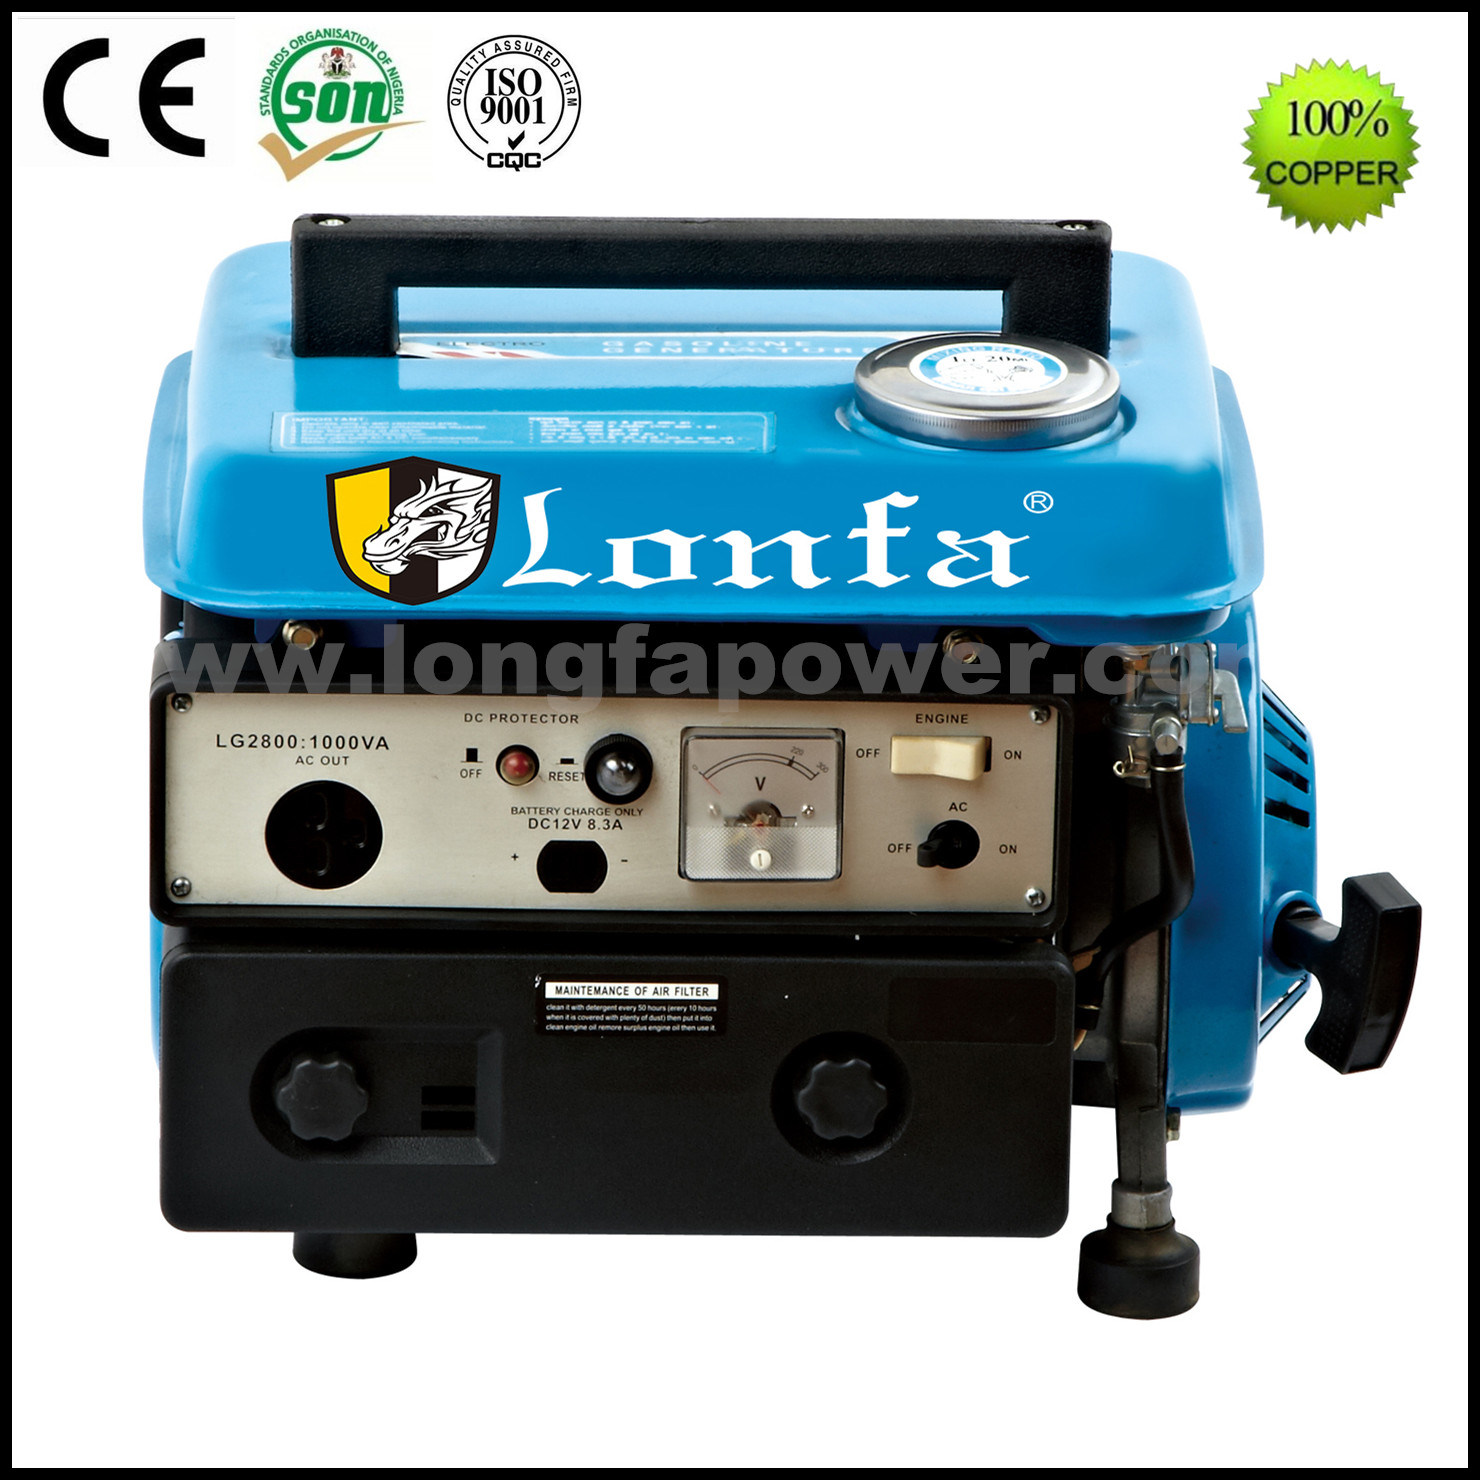 China Lonfa Small Portable Home Use Gasoline Generator 950 Watts